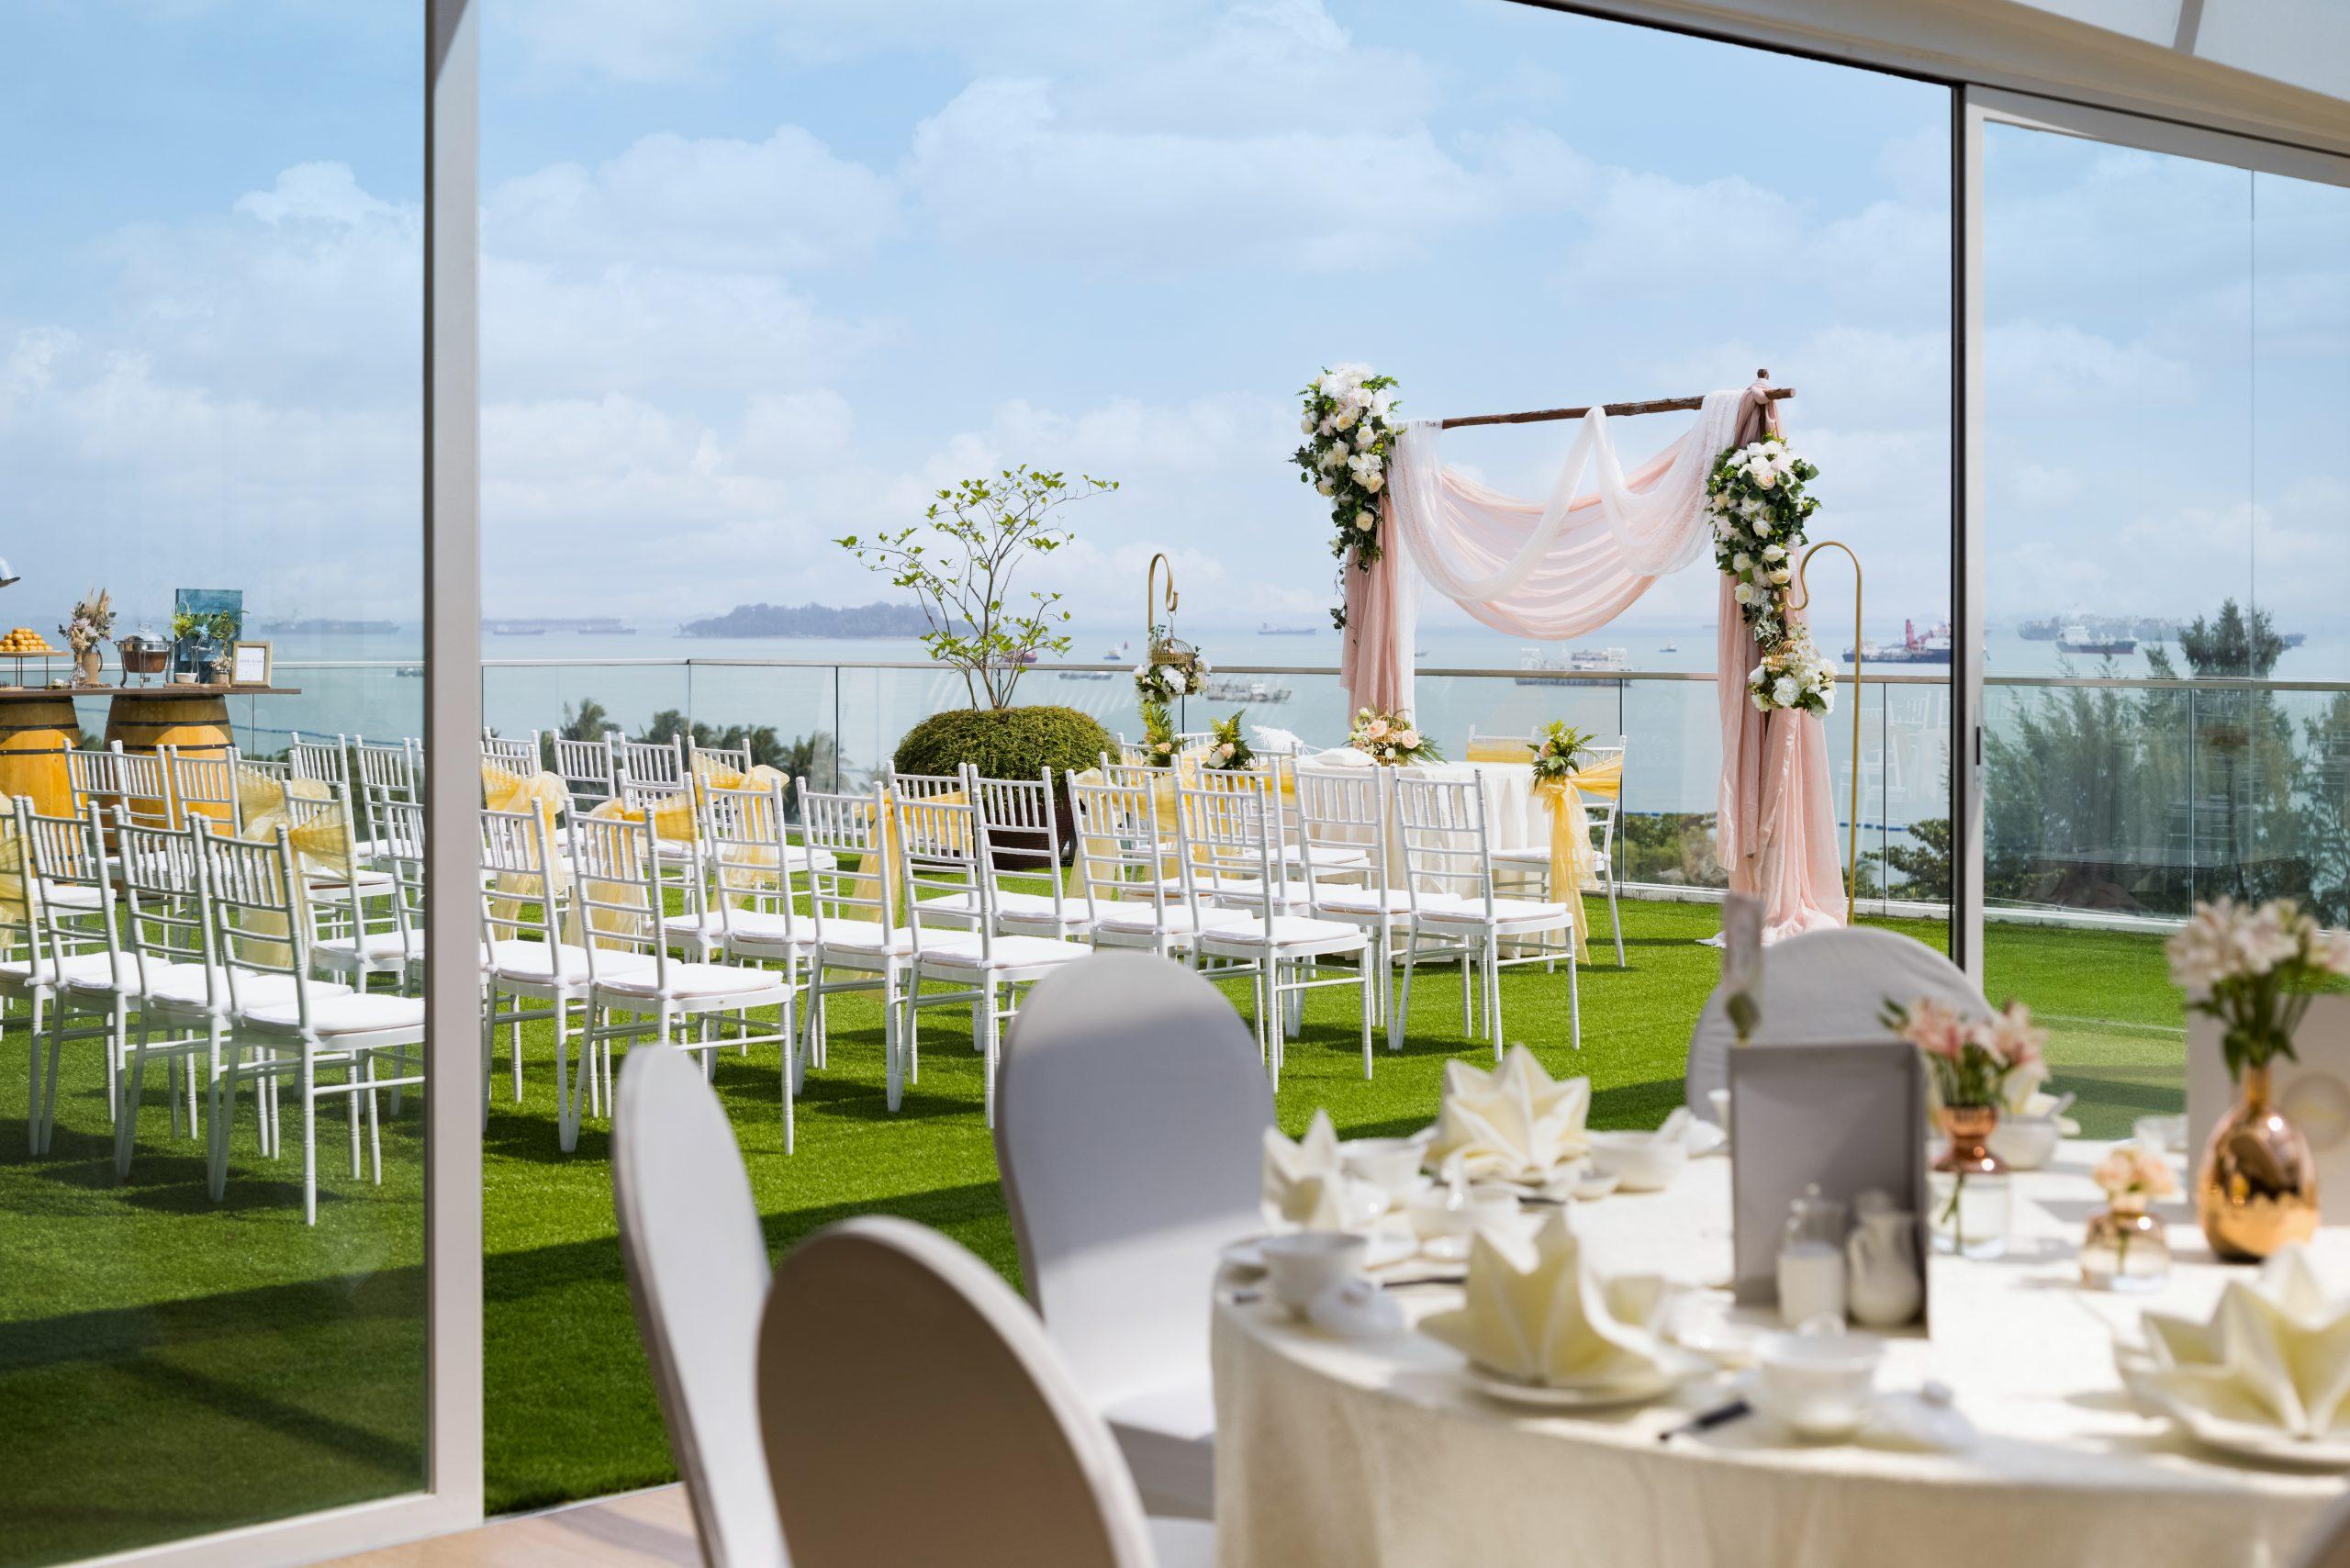 Small Affordable Wedding Venues | Sky Garden